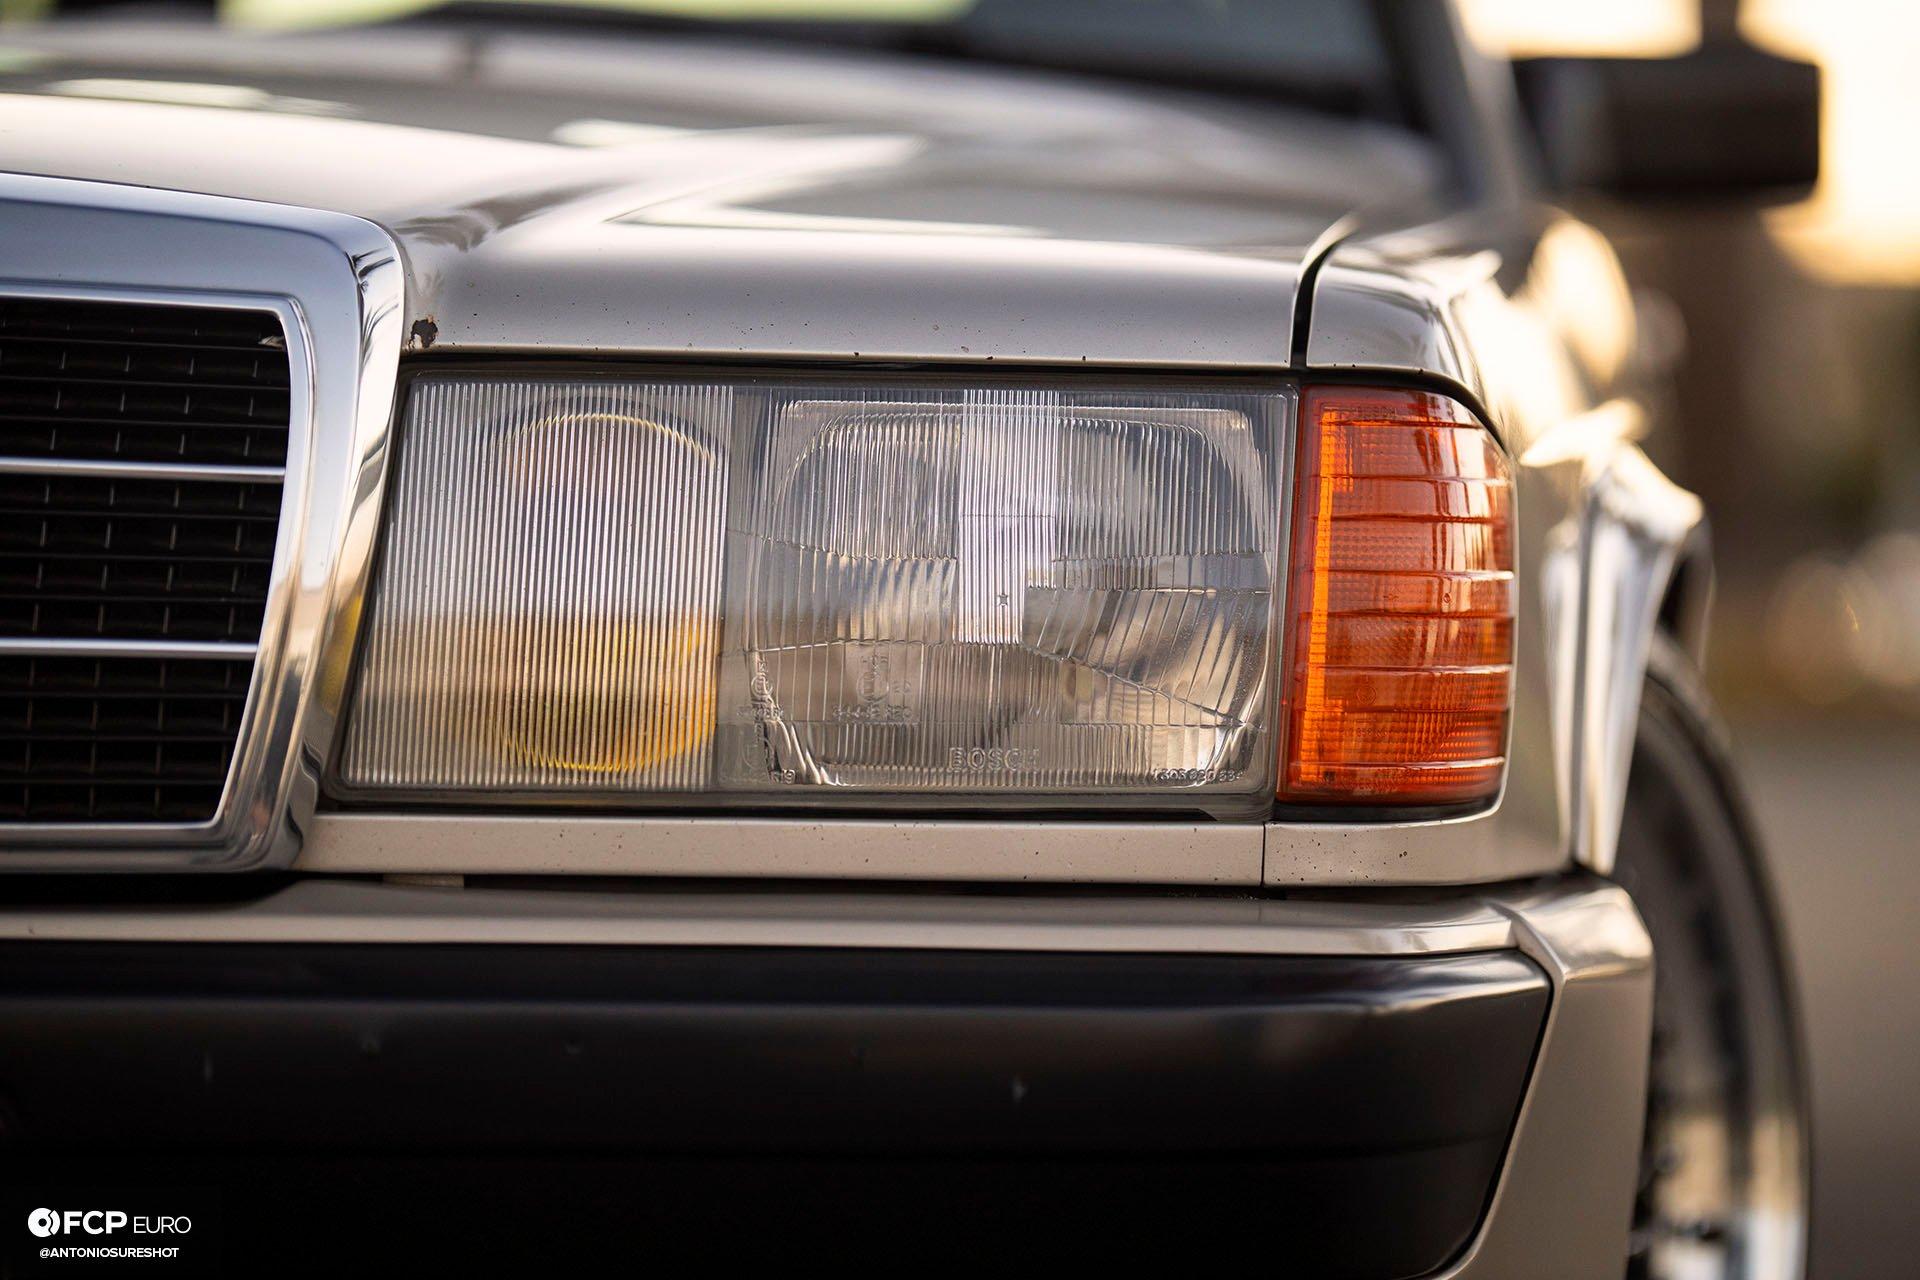 Mercedes Benz 190E 2.3 16v Cosworth EOSR1591